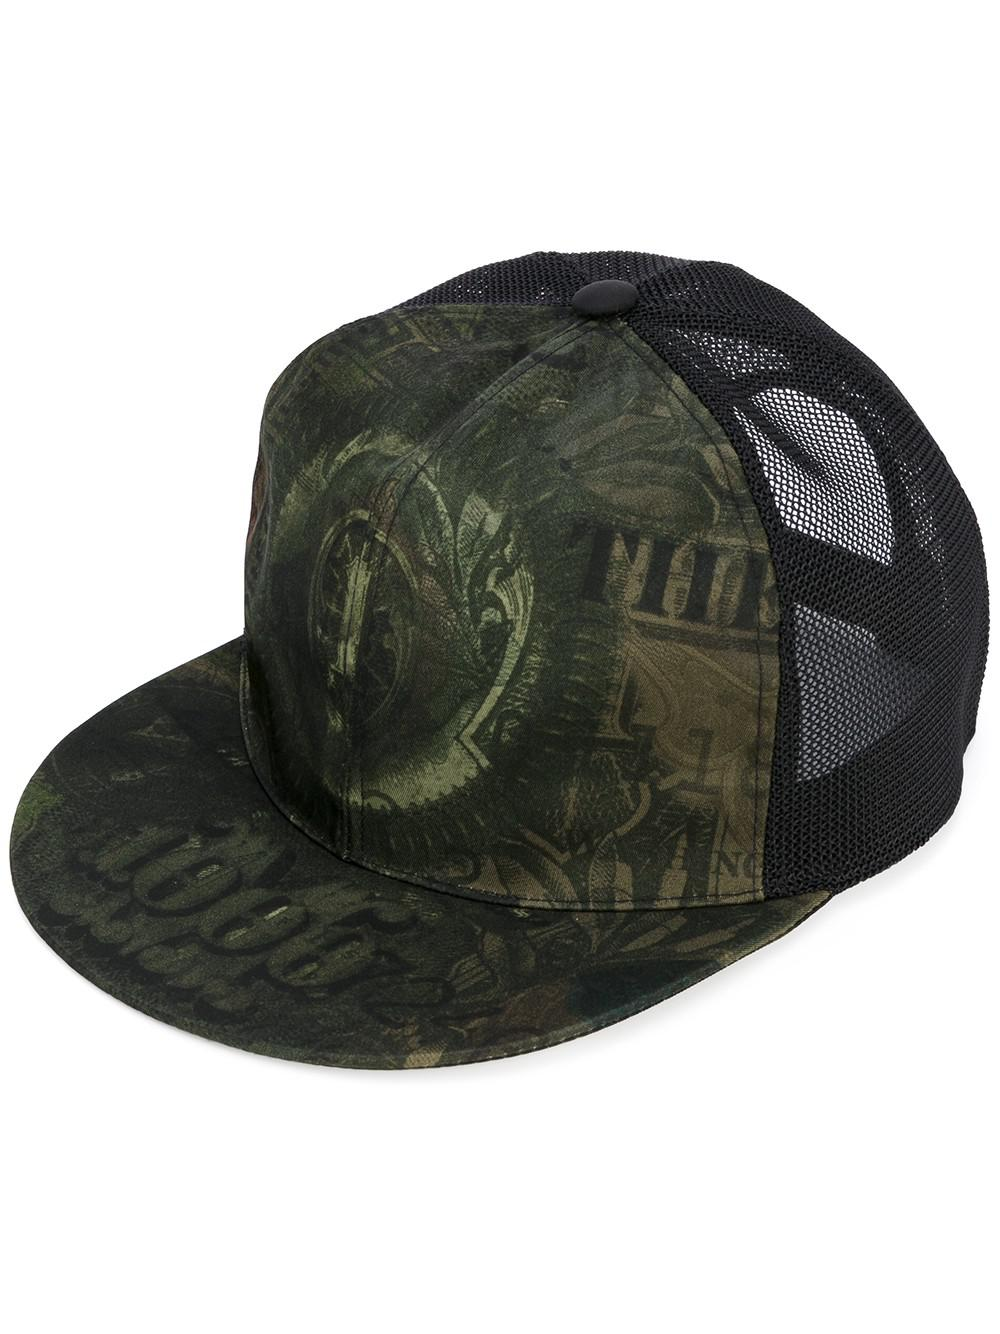 094572065c6253 Givenchy Dollar Print Mesh Cap for Men - Lyst